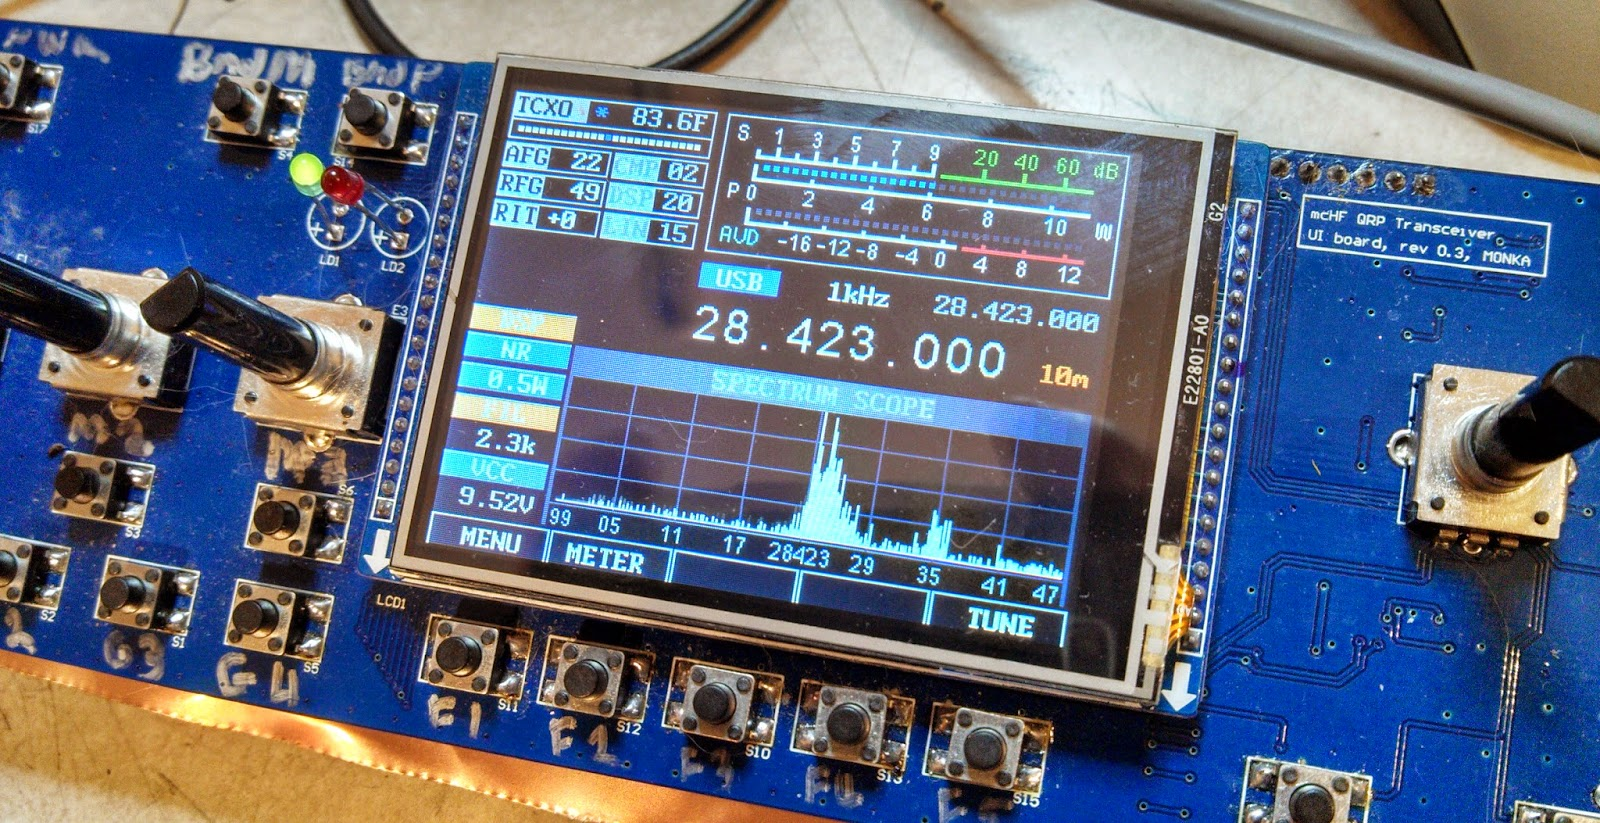 Mute arduino transmitter : RTLSDR - redditcom